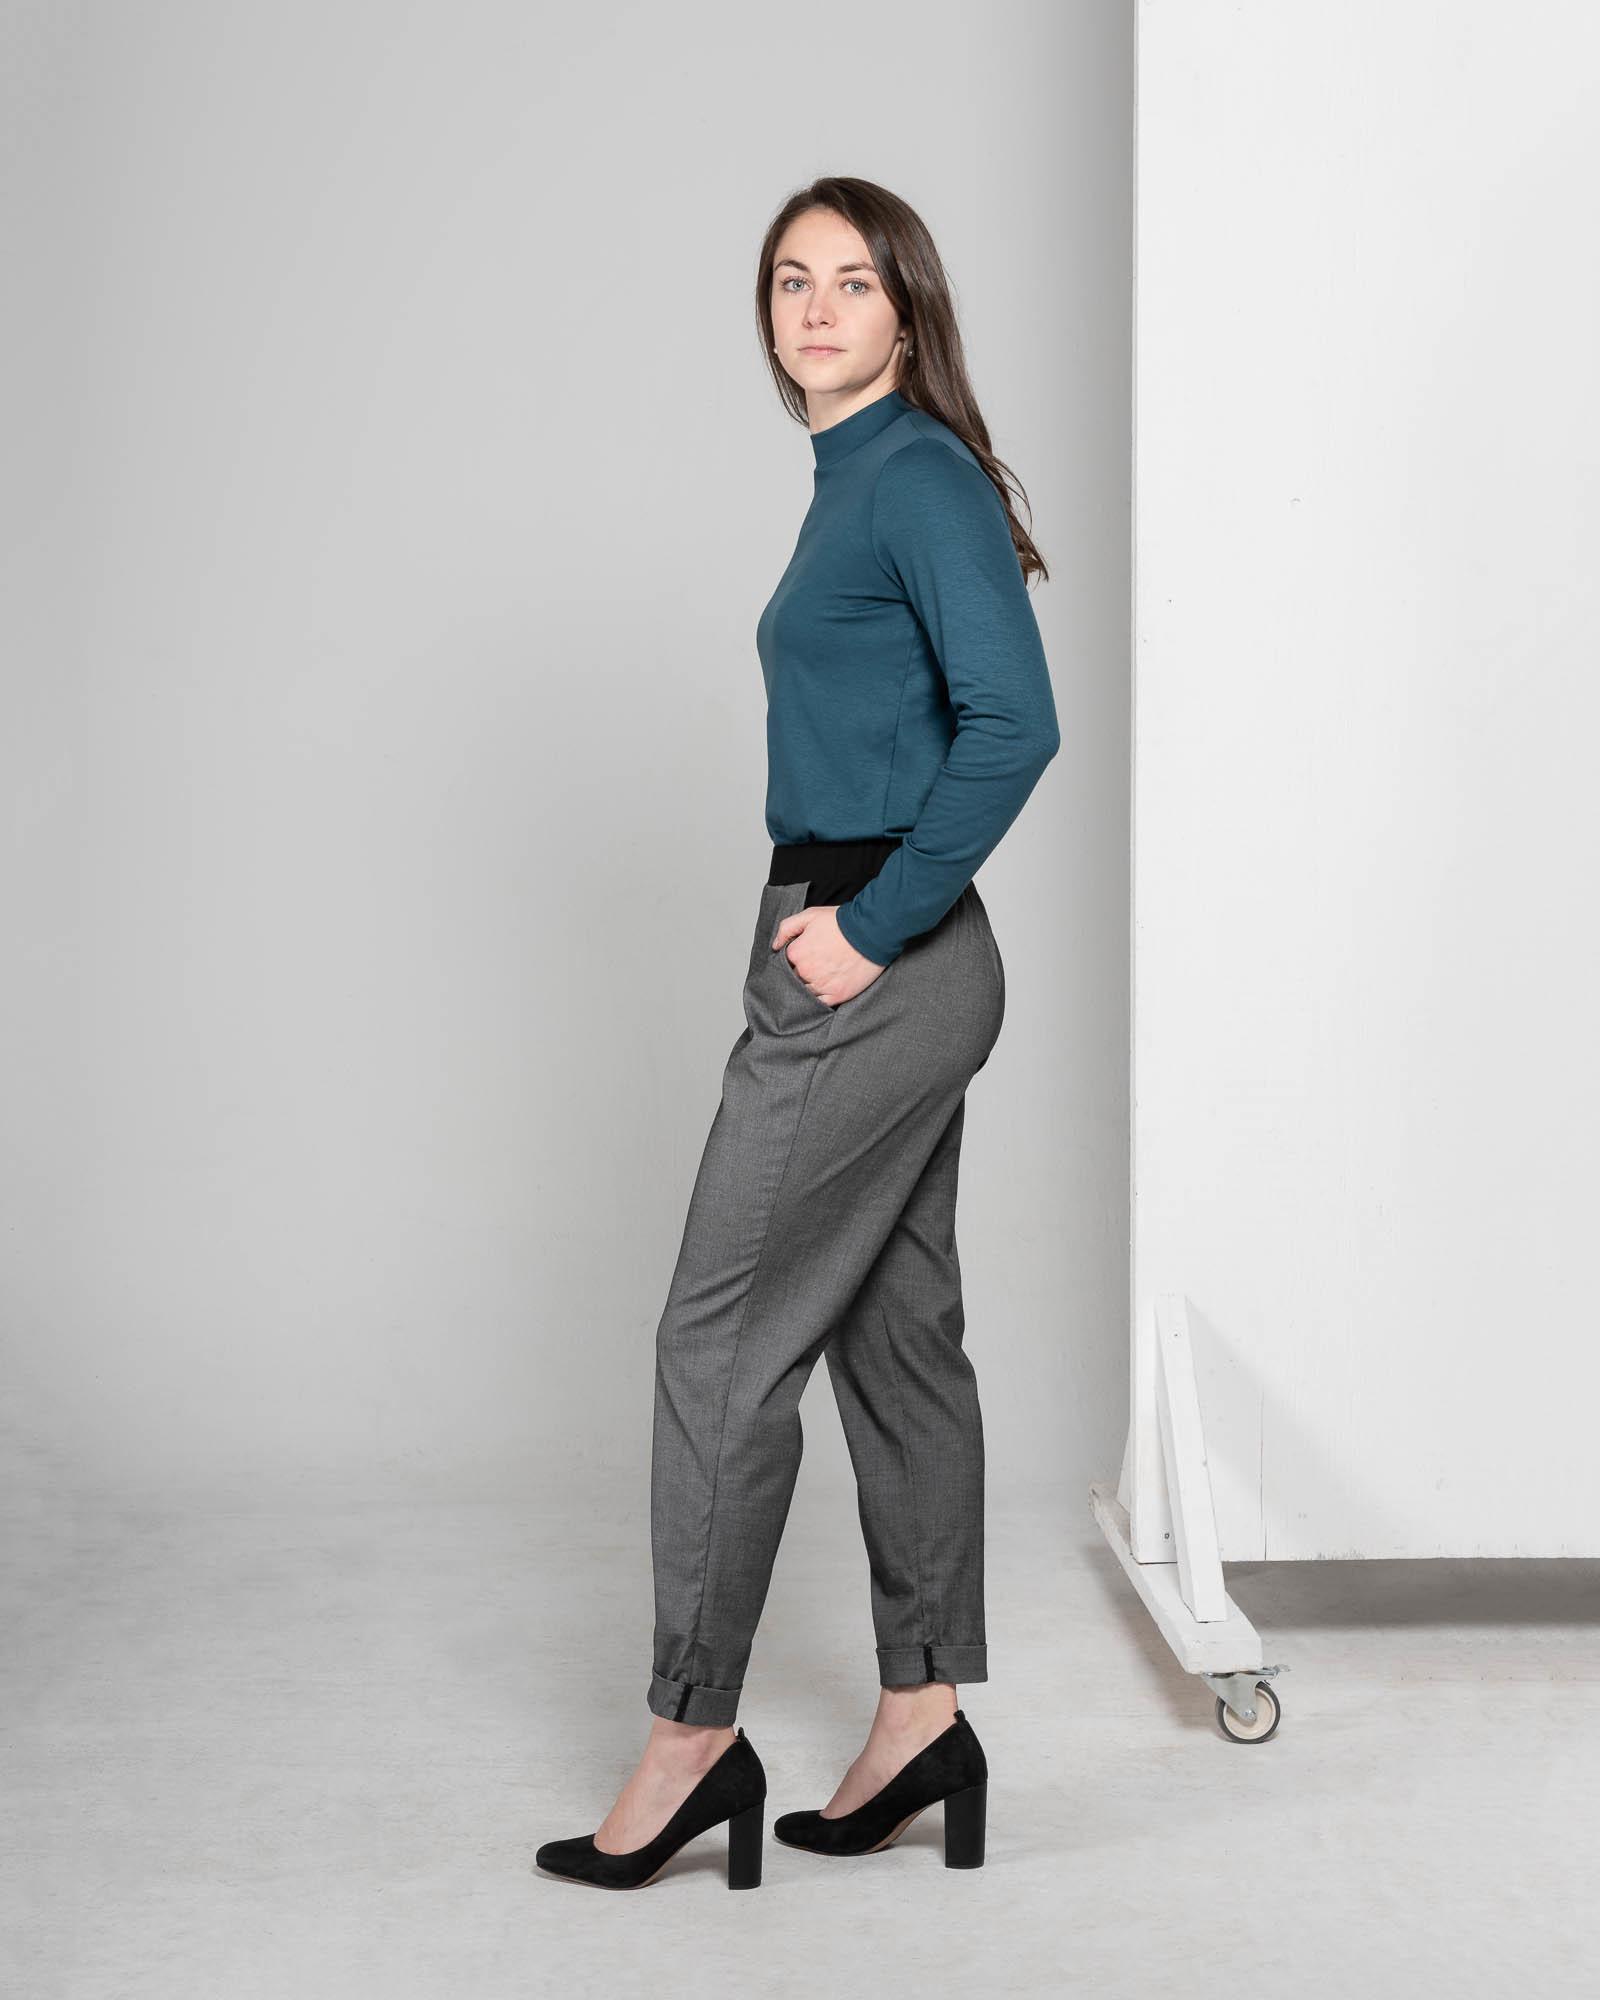 MAS Montreal MAS - Madelaine Cuffed Pants (Grey & Black)